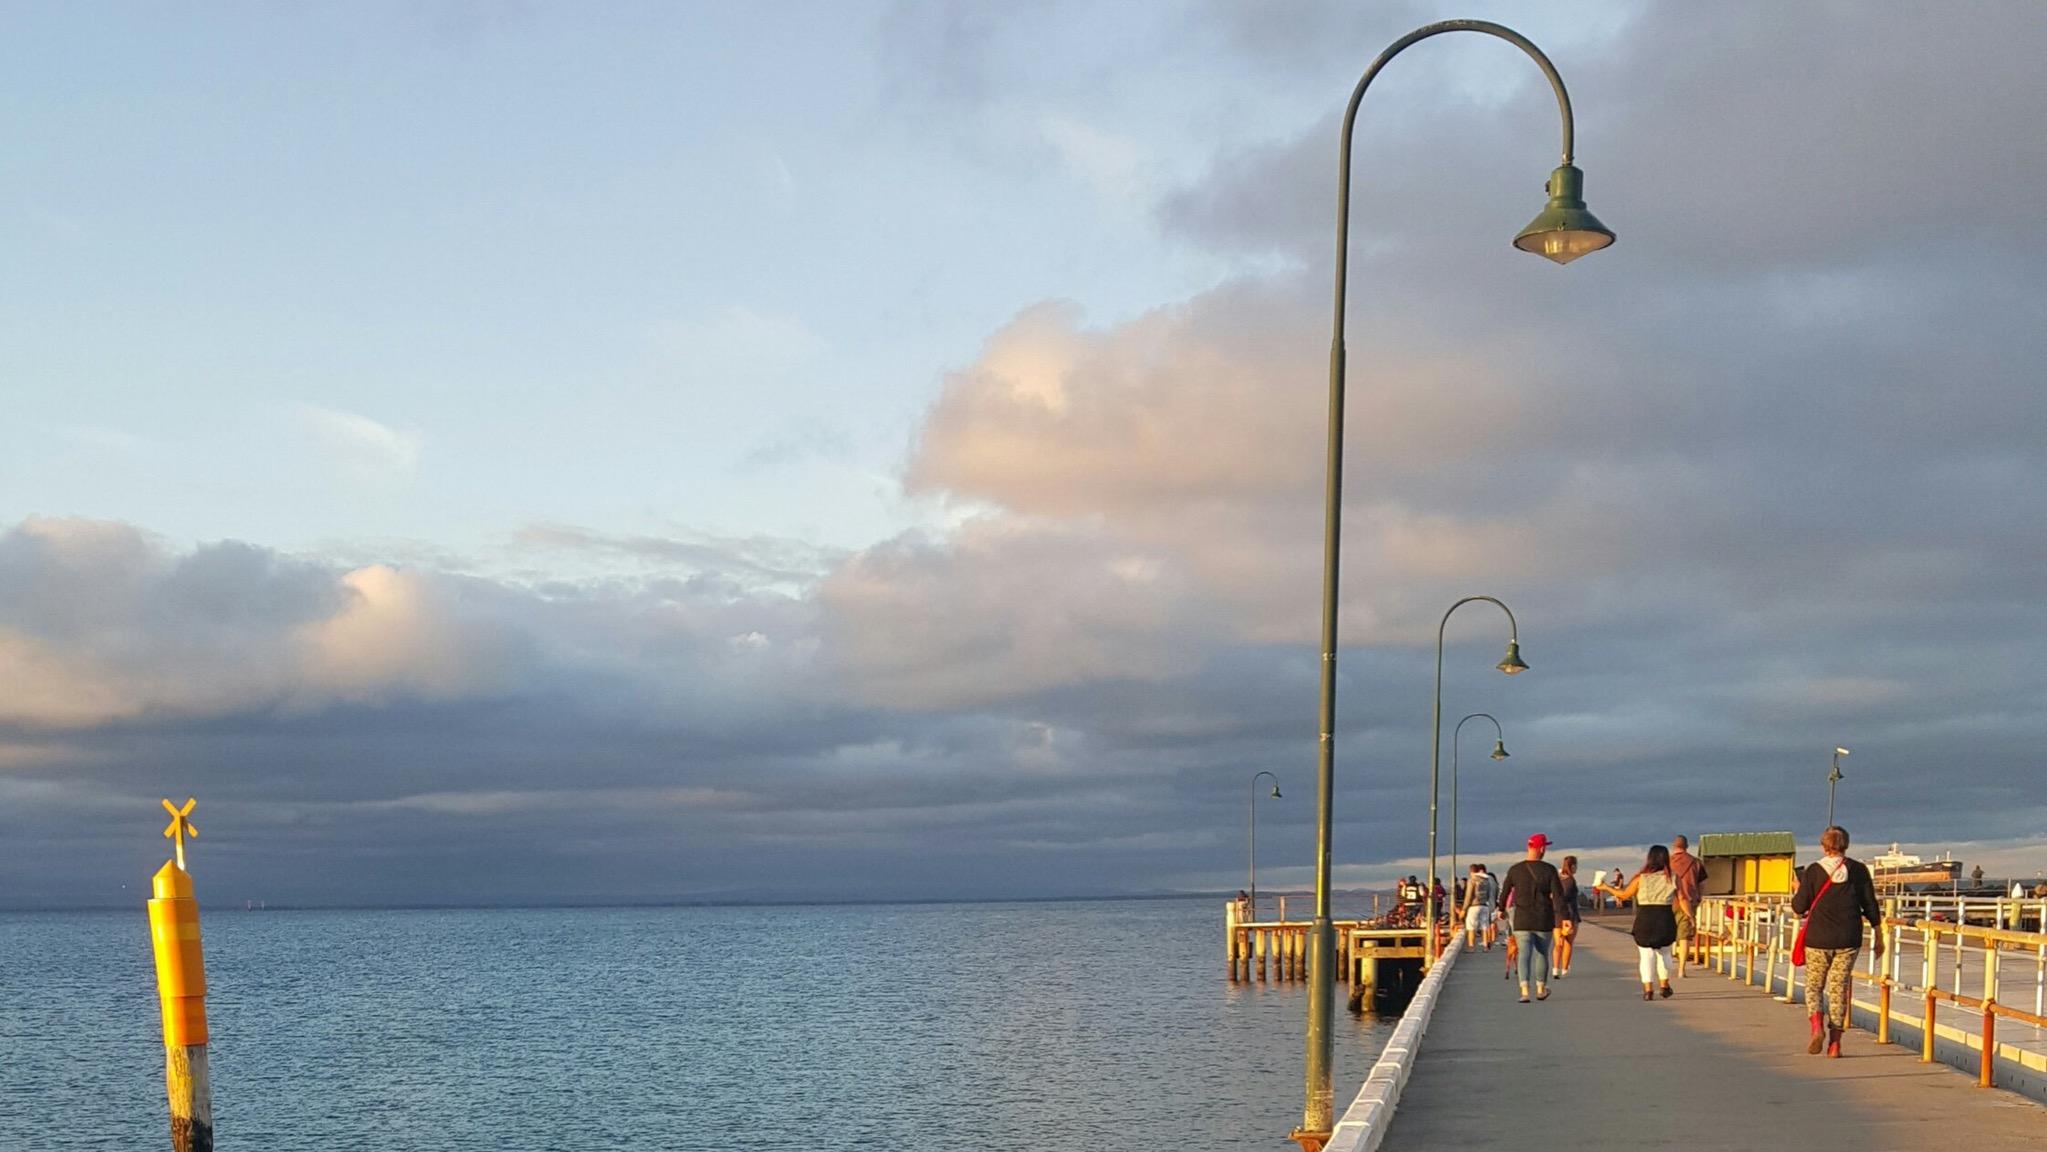 Port Pier